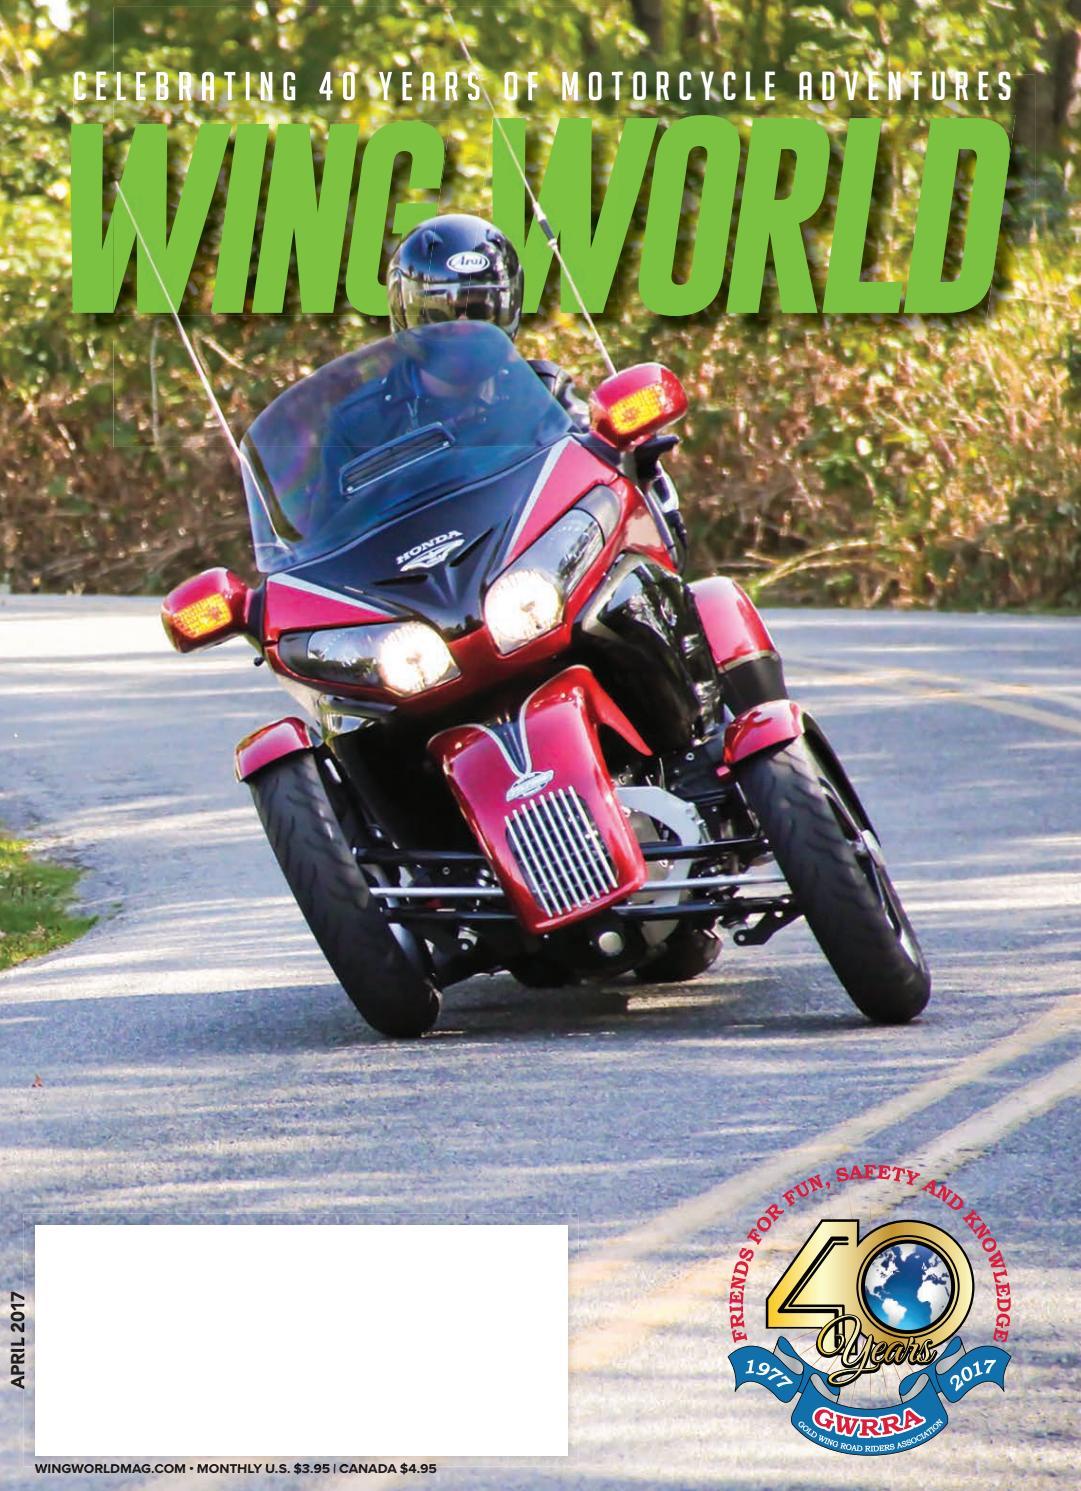 MRE Murdoch Racing DECAL STICKER MOTORCYCLE lock up clutch DRAGBIKE MOTOCROSS